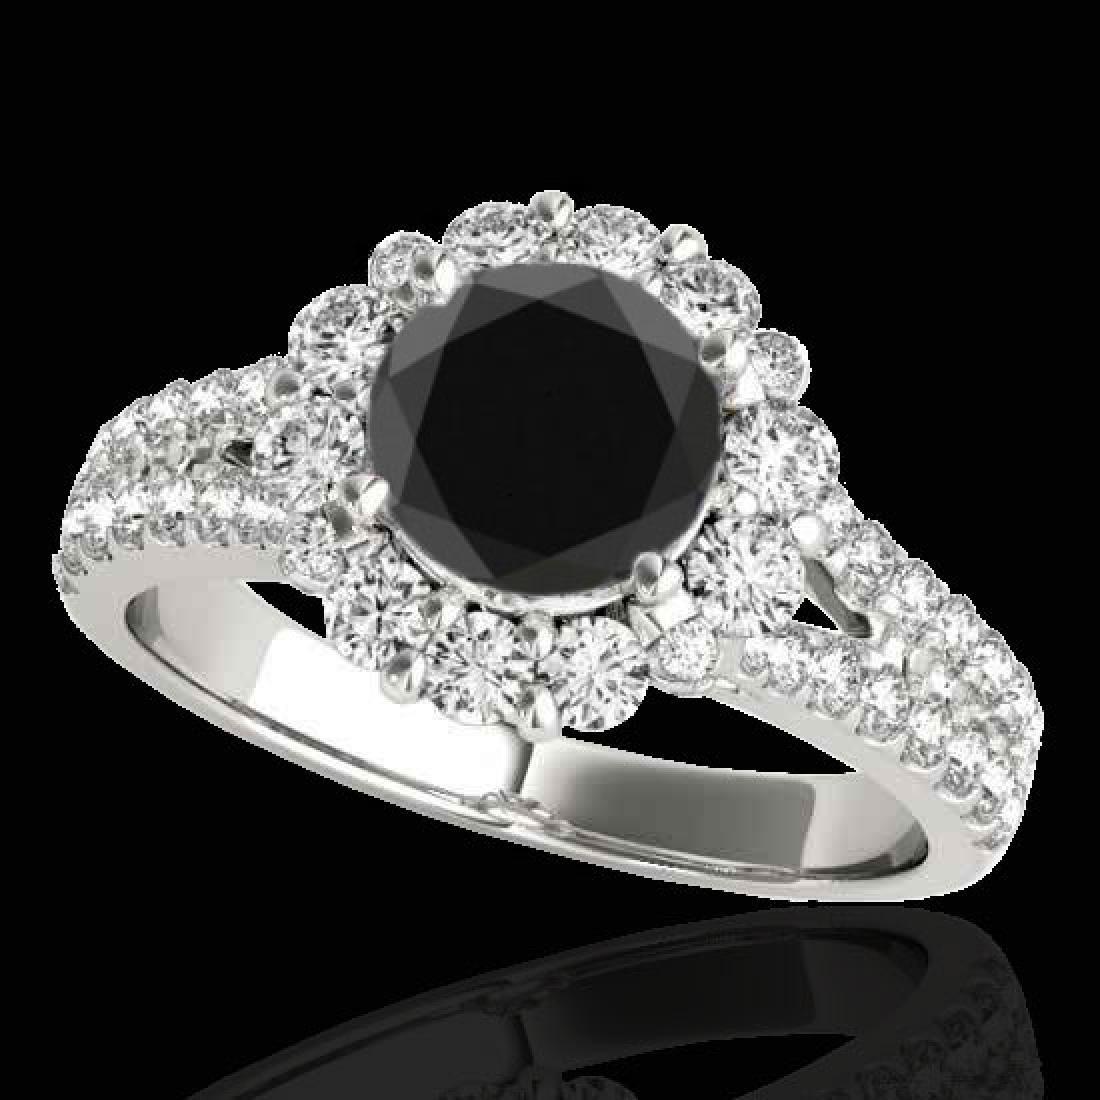 2.51 CTW Certified VS Black Diamond Solitaire Halo Ring